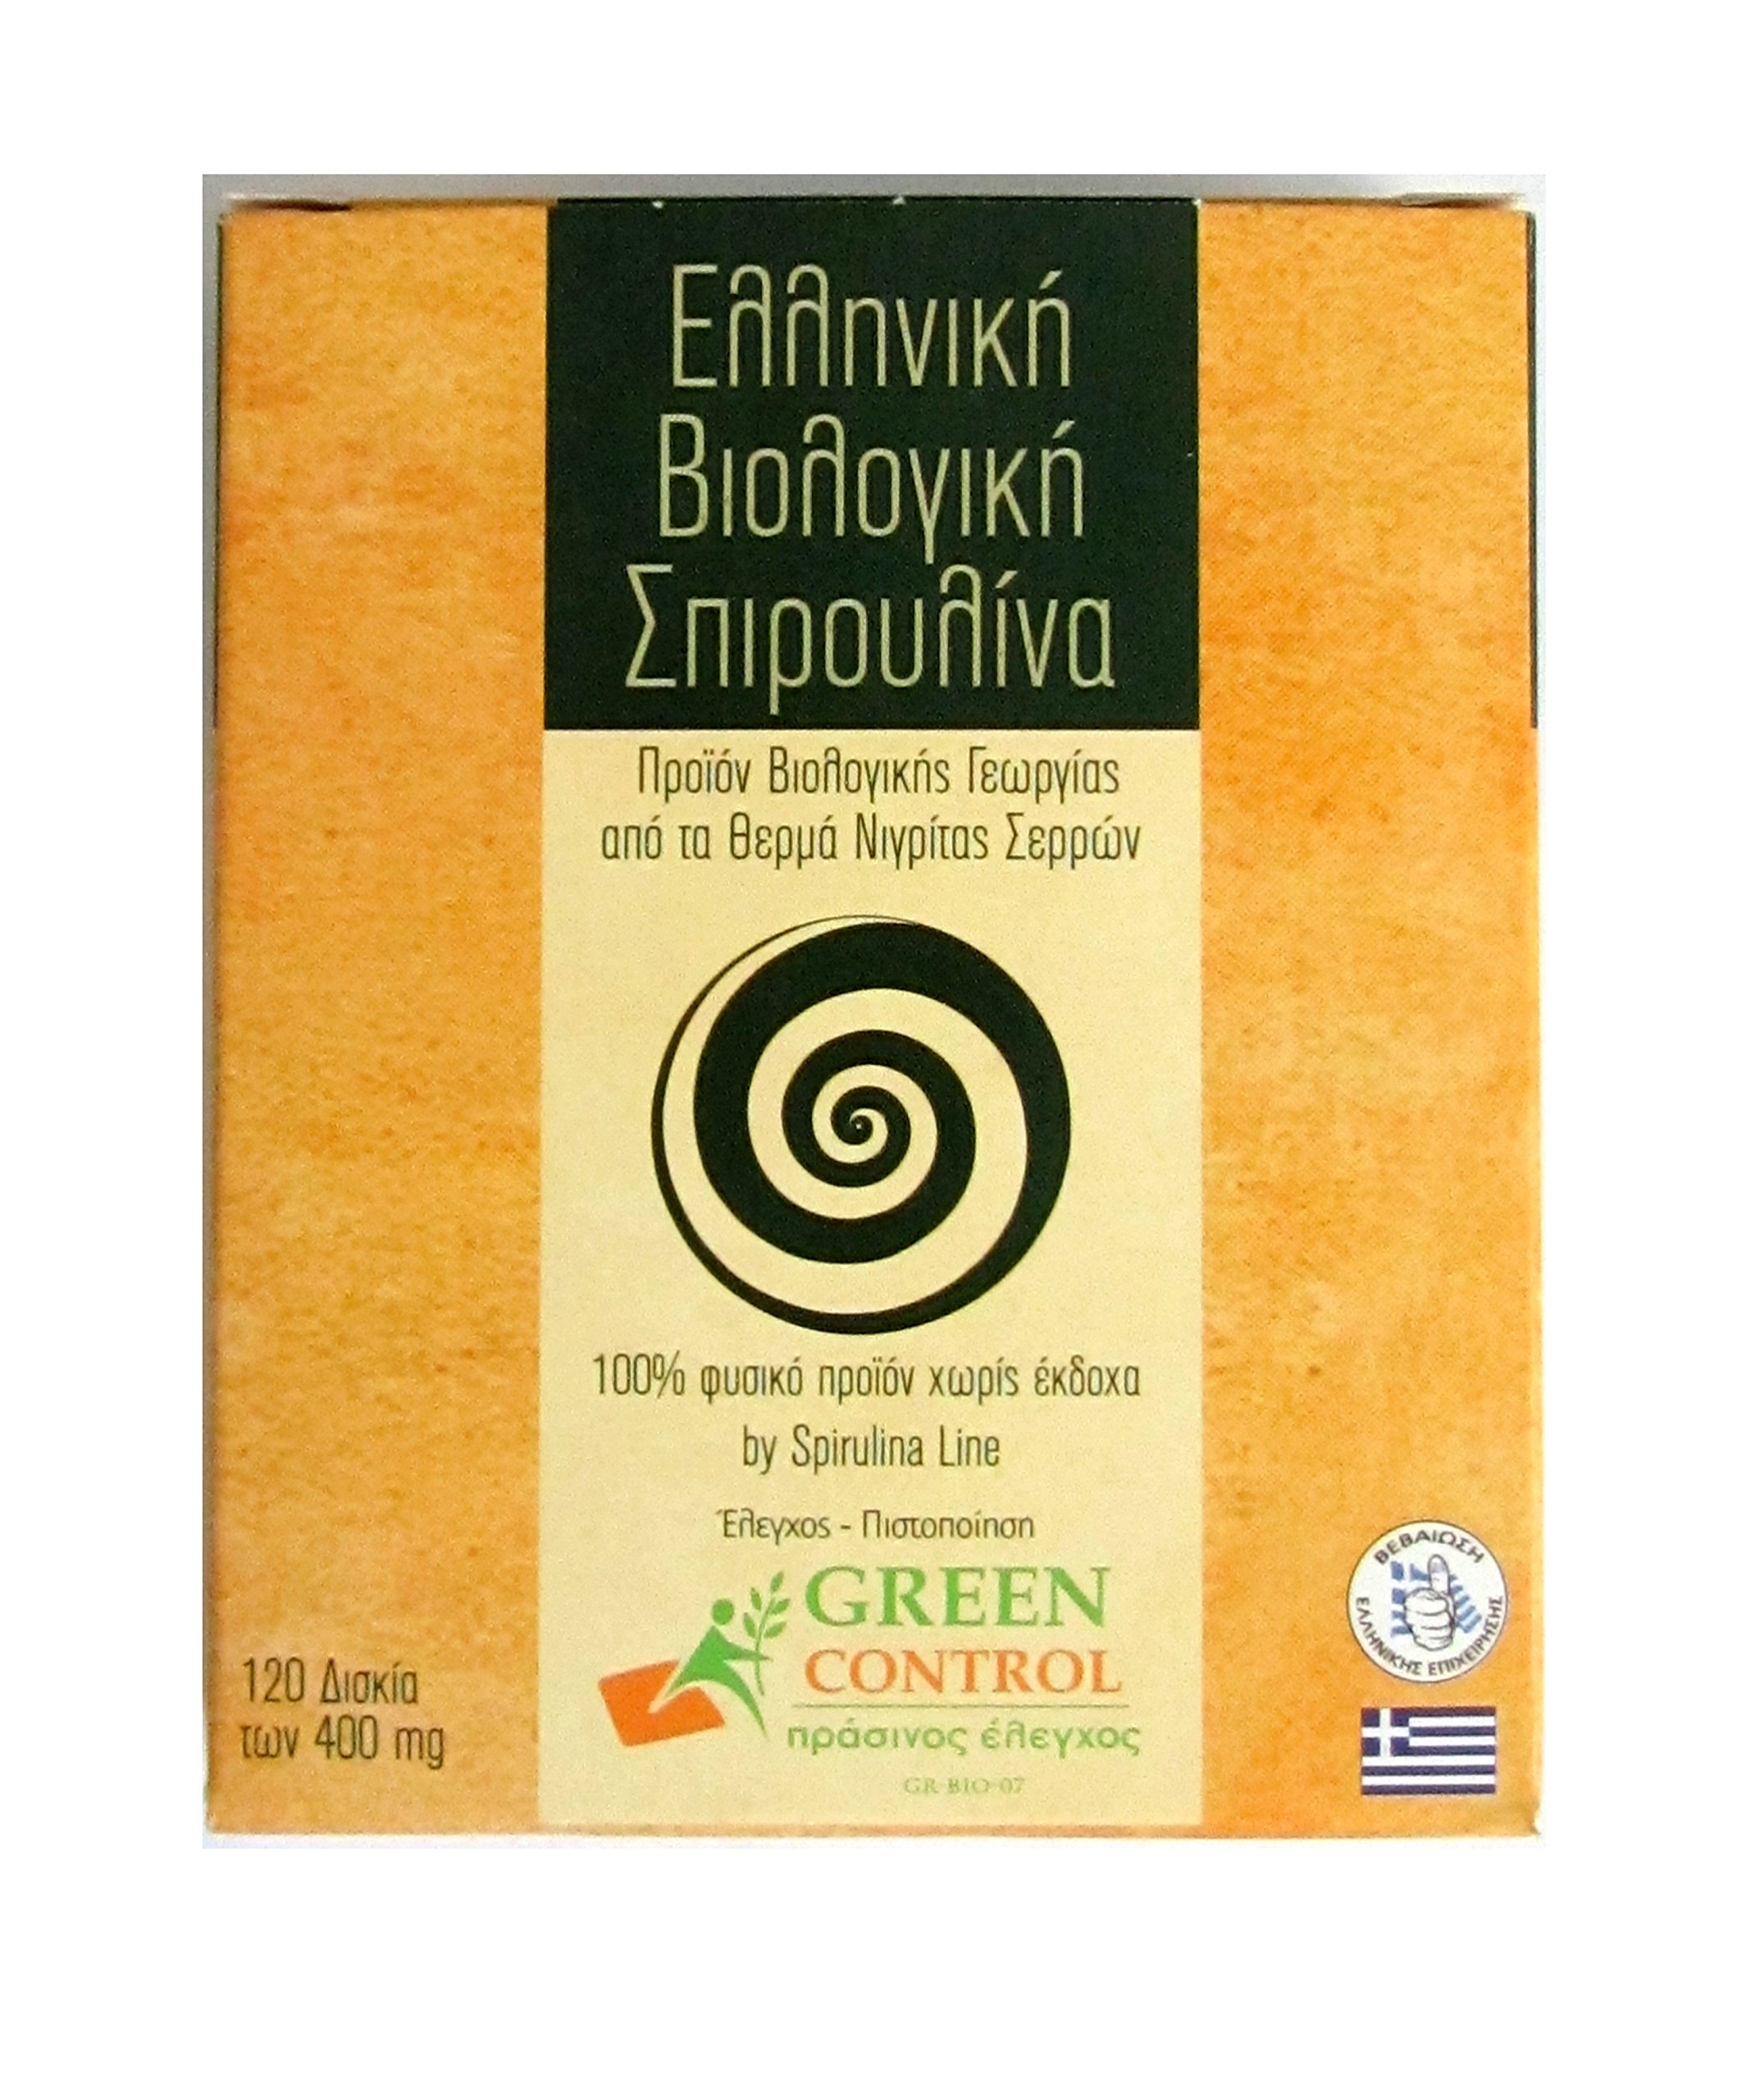 Greek Bio Organic Spirulina Tablets 400mg Pack of 120 - No Iodine